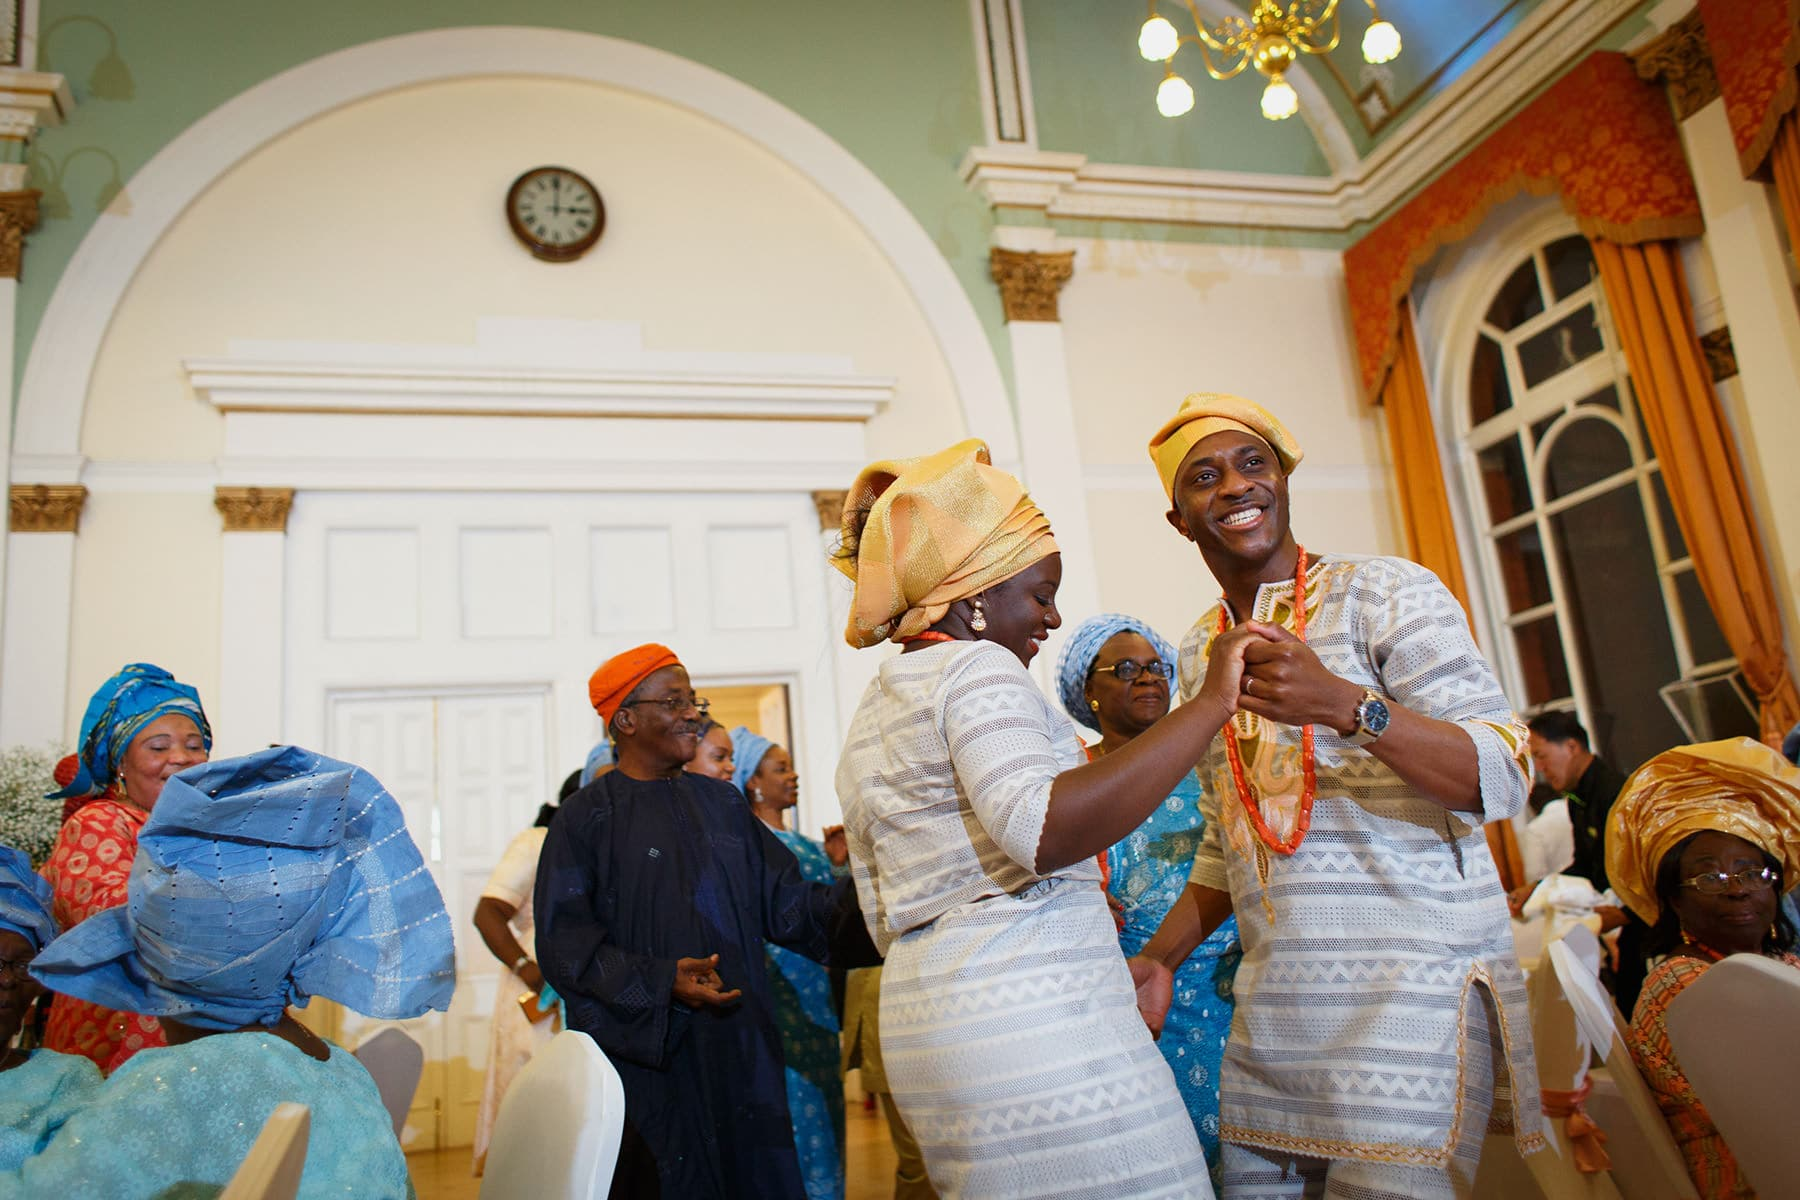 bola and oladele dance into their leyton great hall wedding